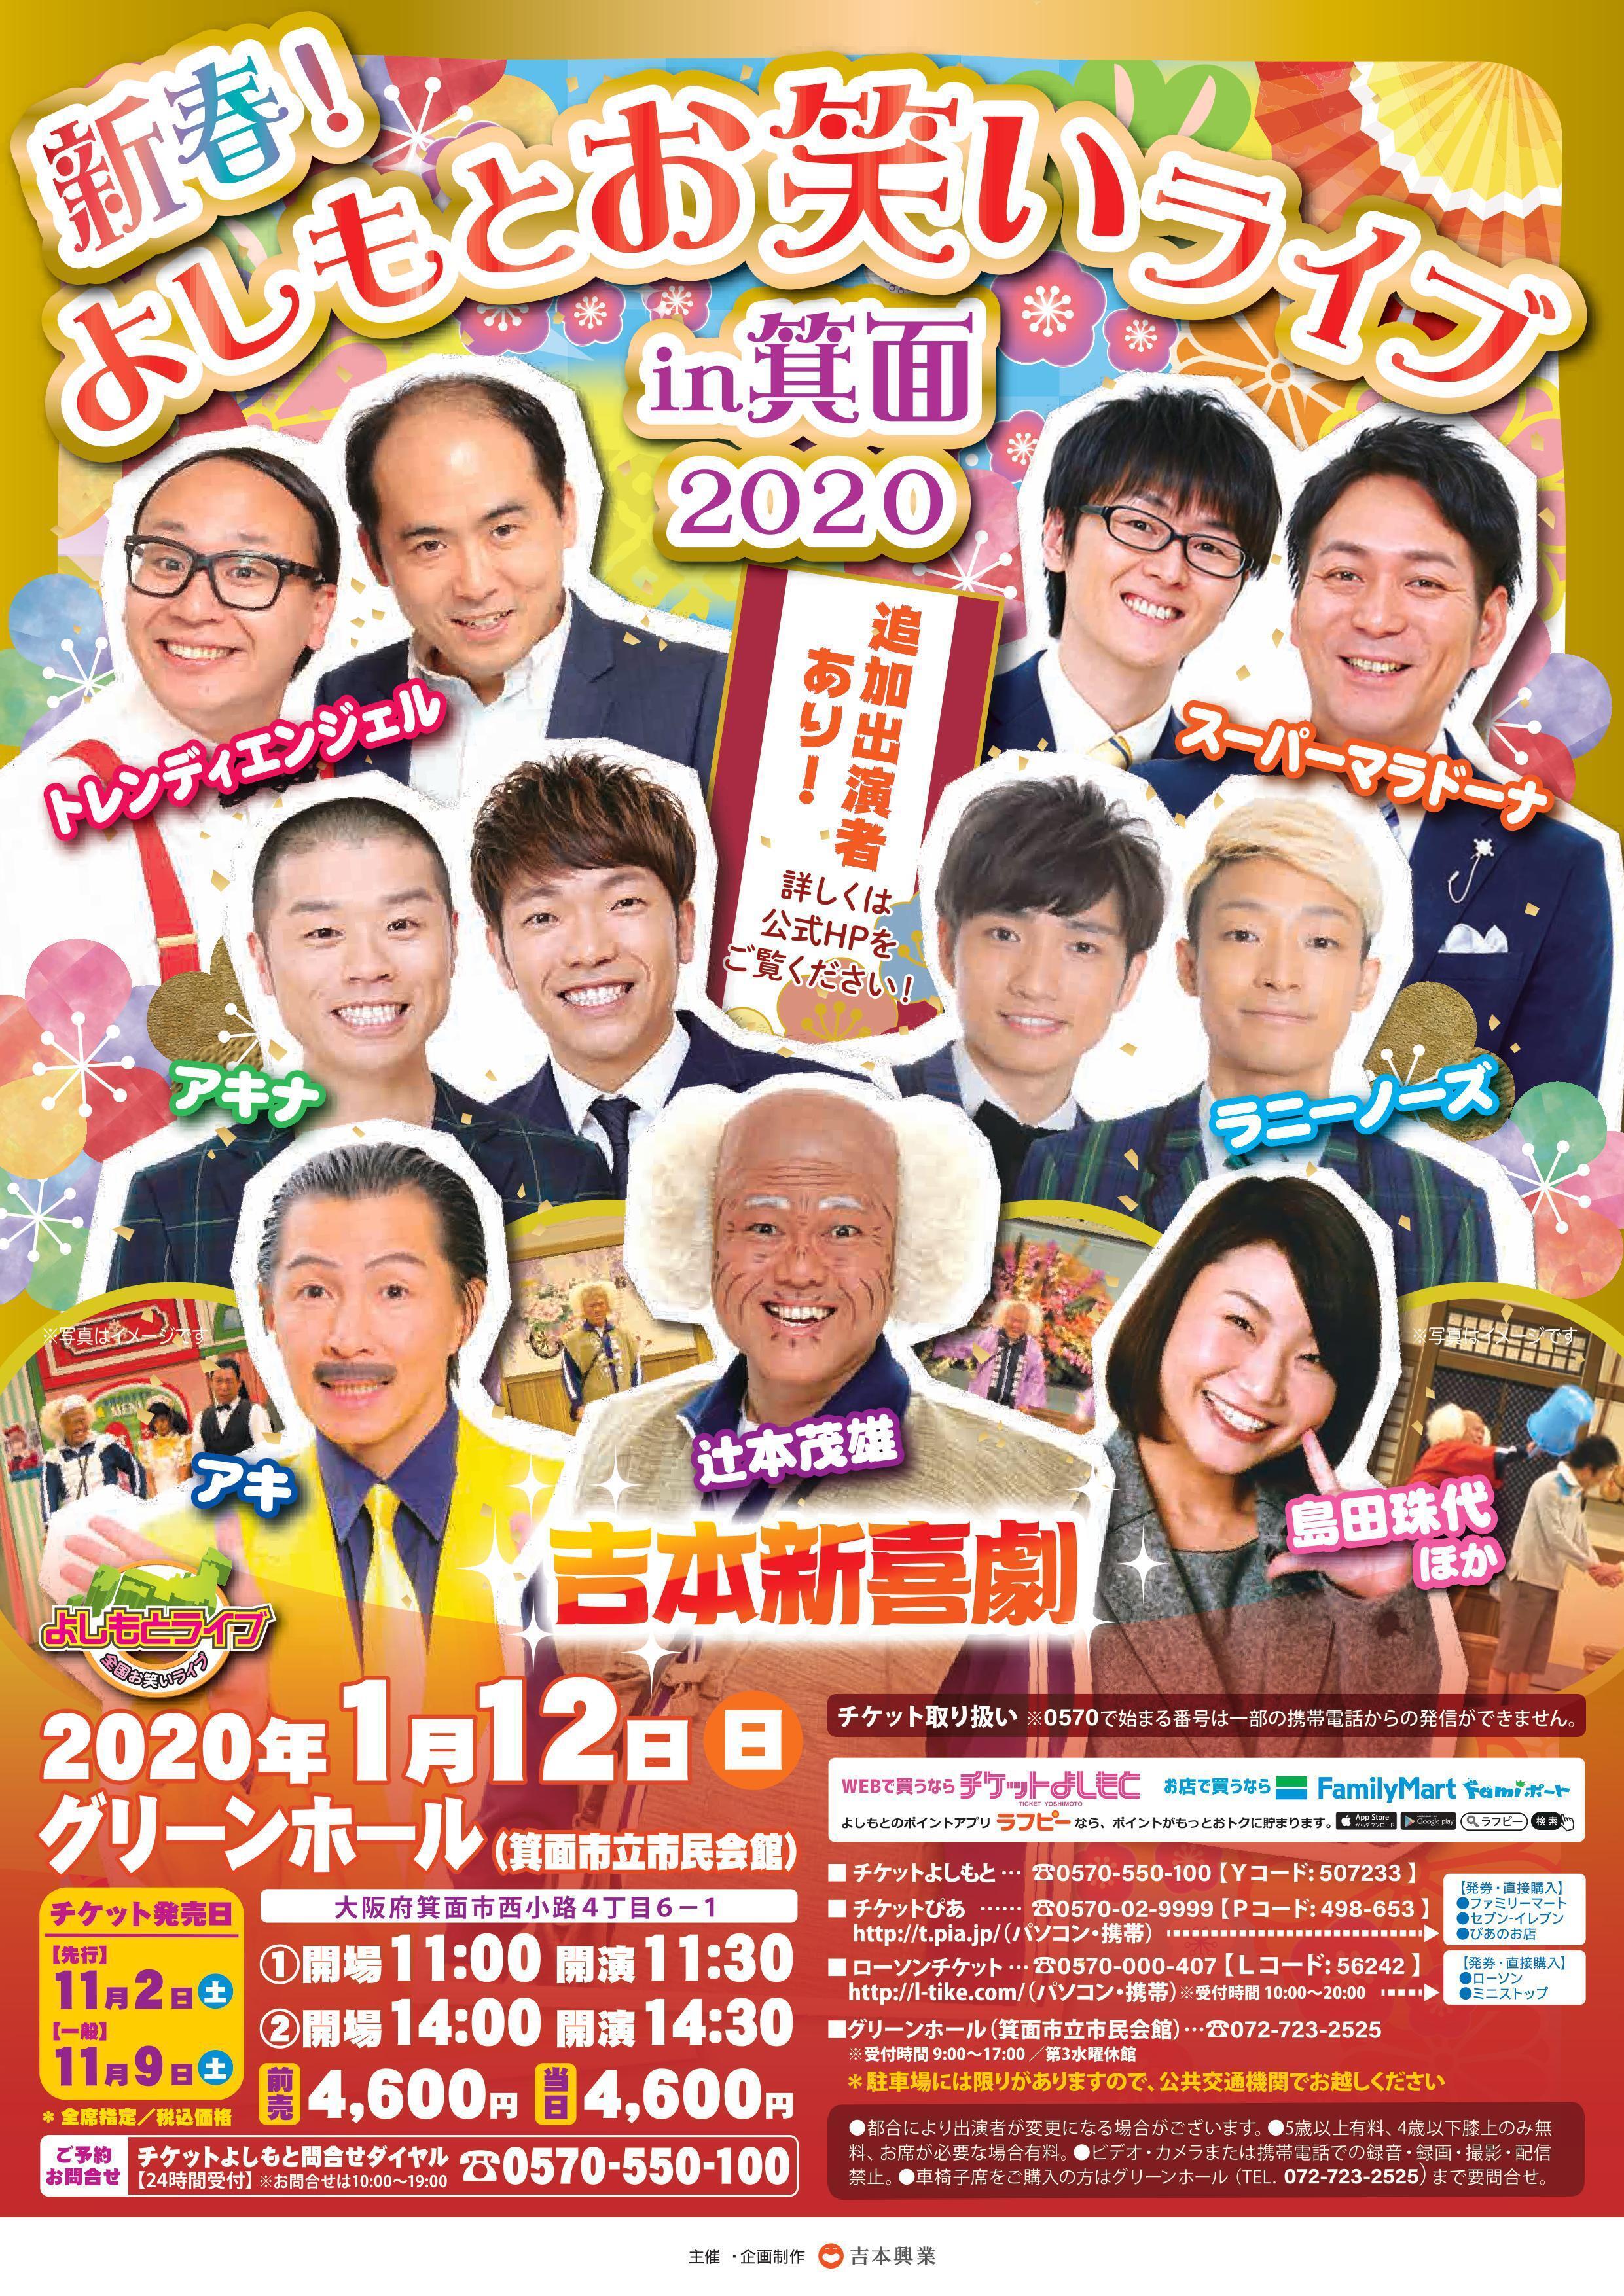 http://www.syumatsu.jp/20191107112849-8448197bd296824fd60b9f0f8634311f18d694c5.jpg